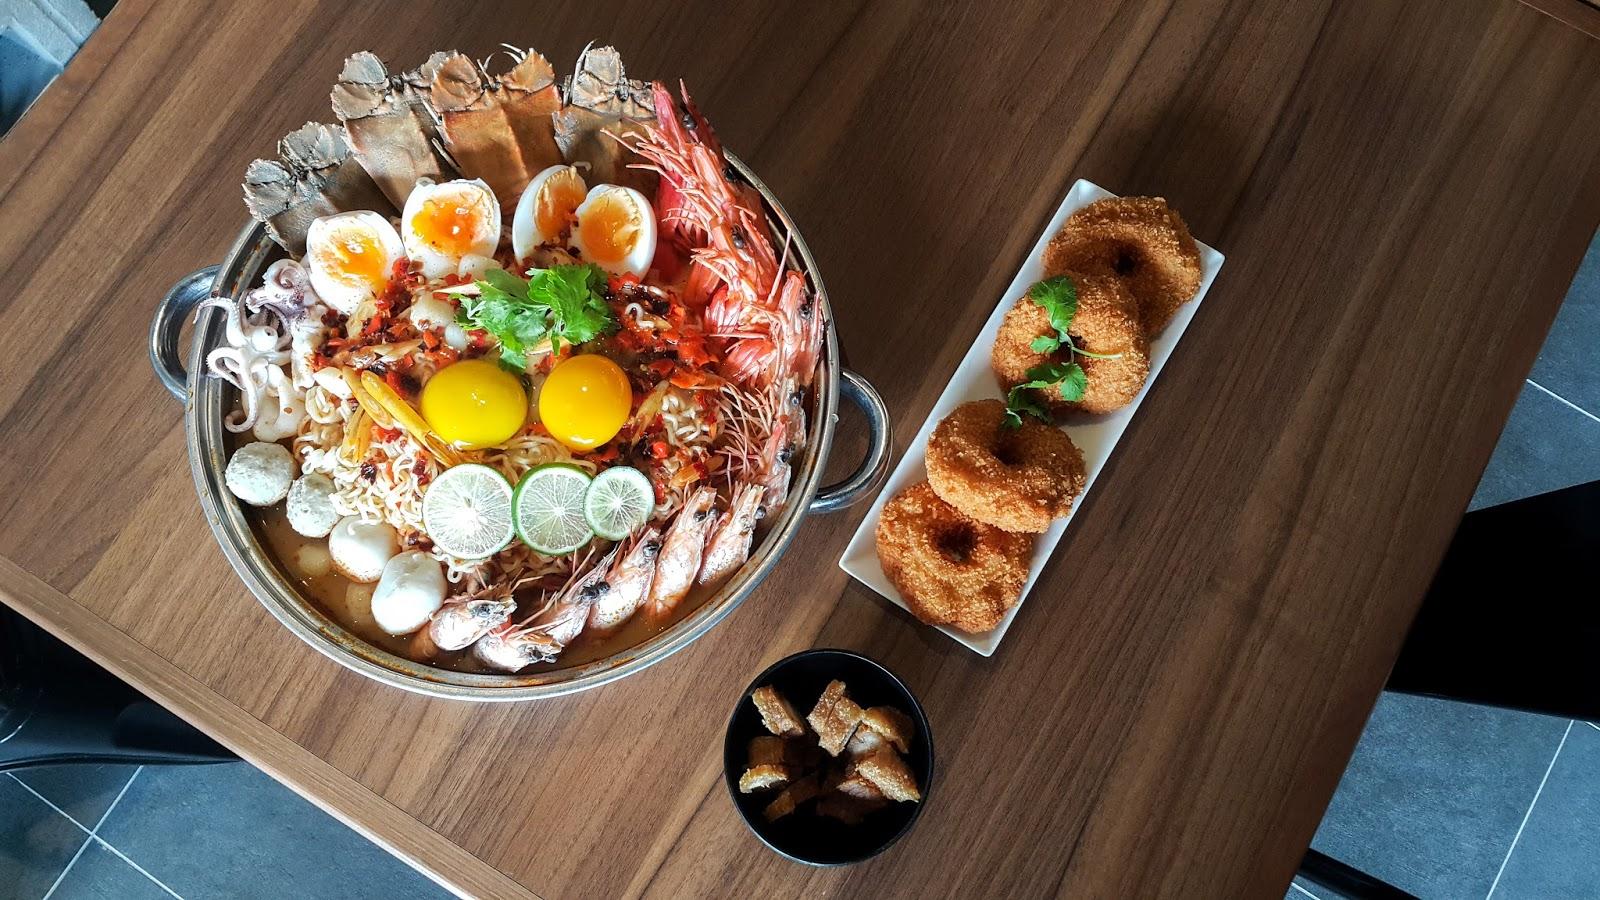 Pim S Thai Food Bukit Tinggi 2 Klang Miriam Merrygoround